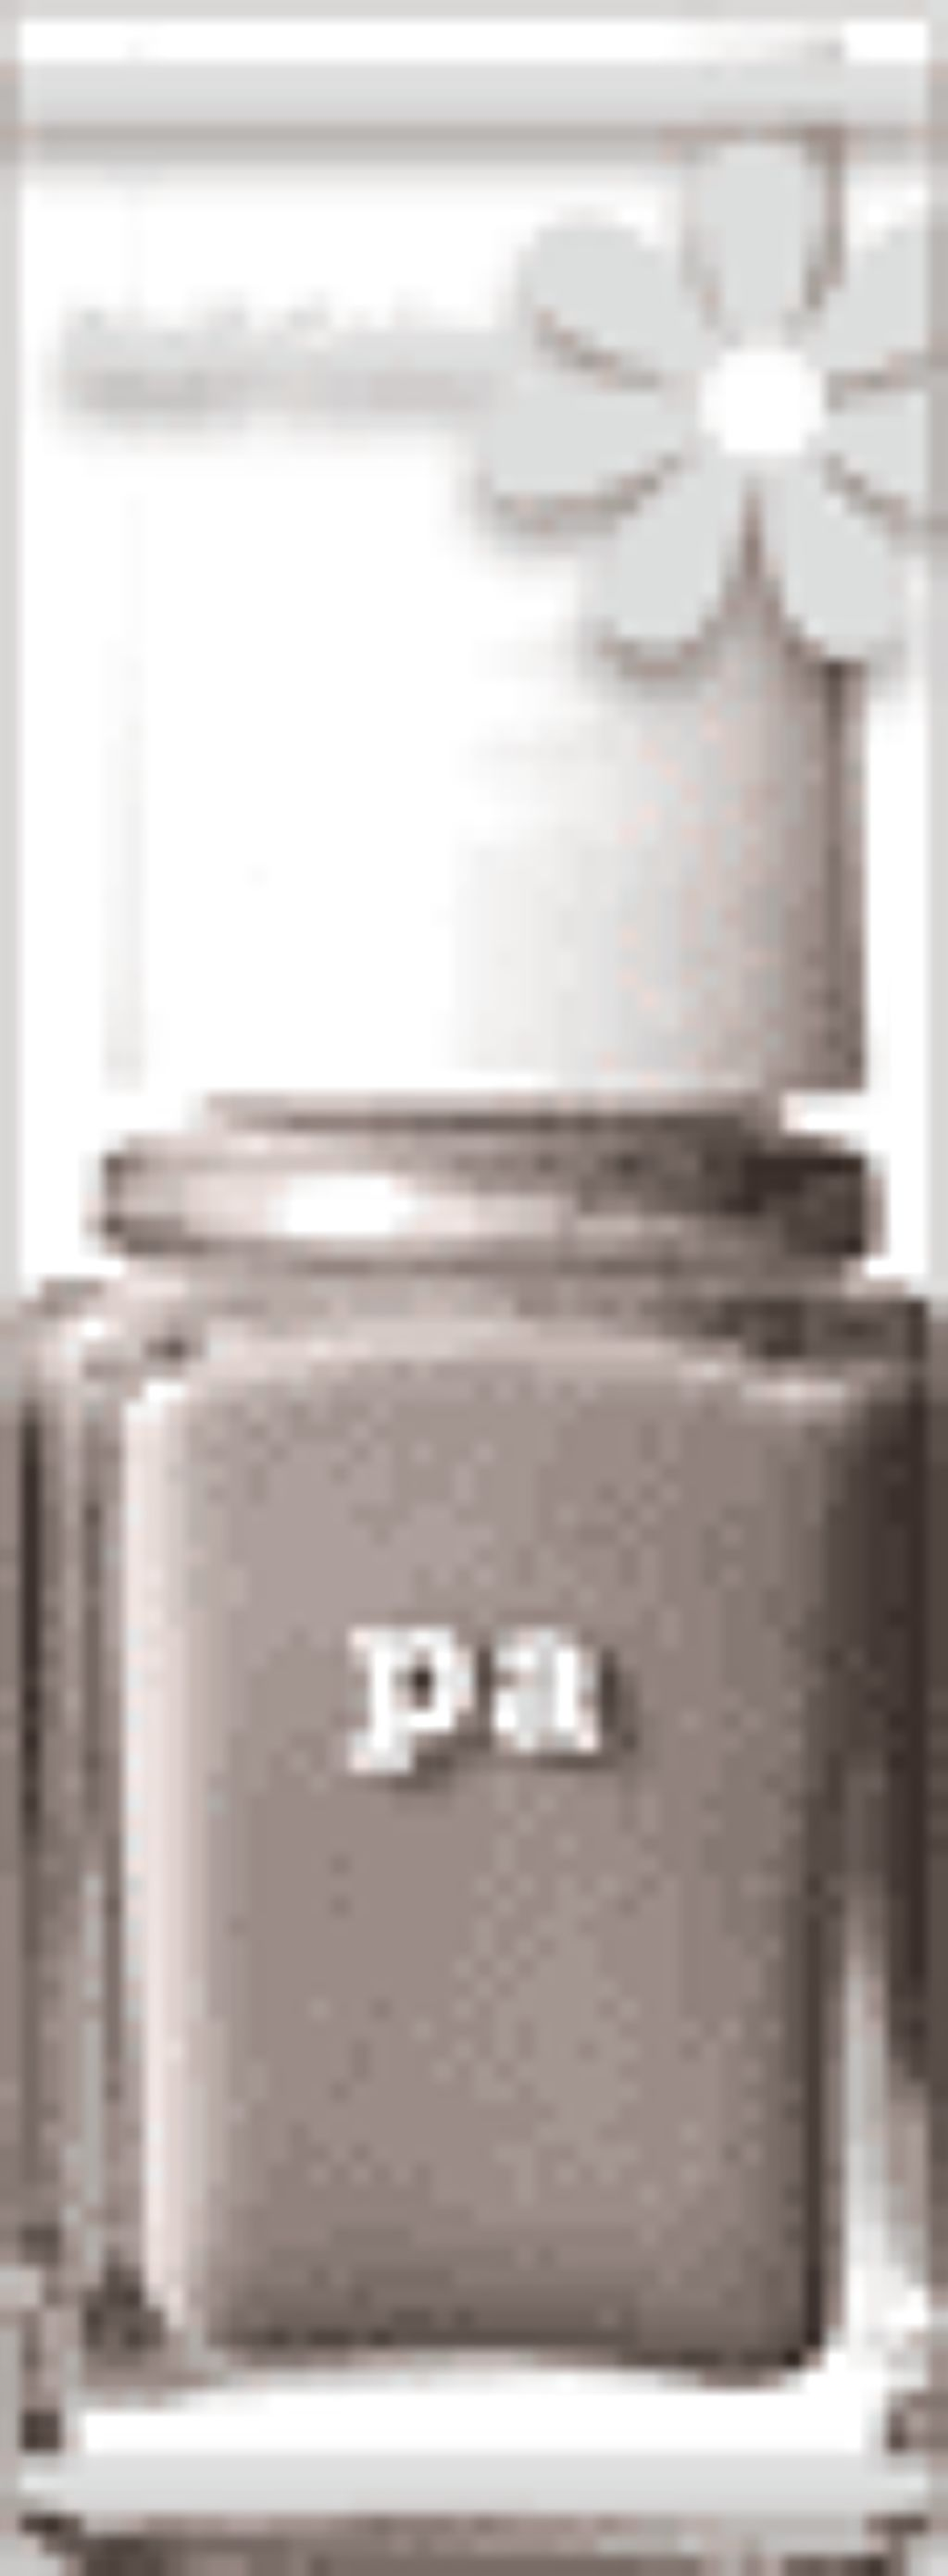 pa ネイルカラー(旧) A15